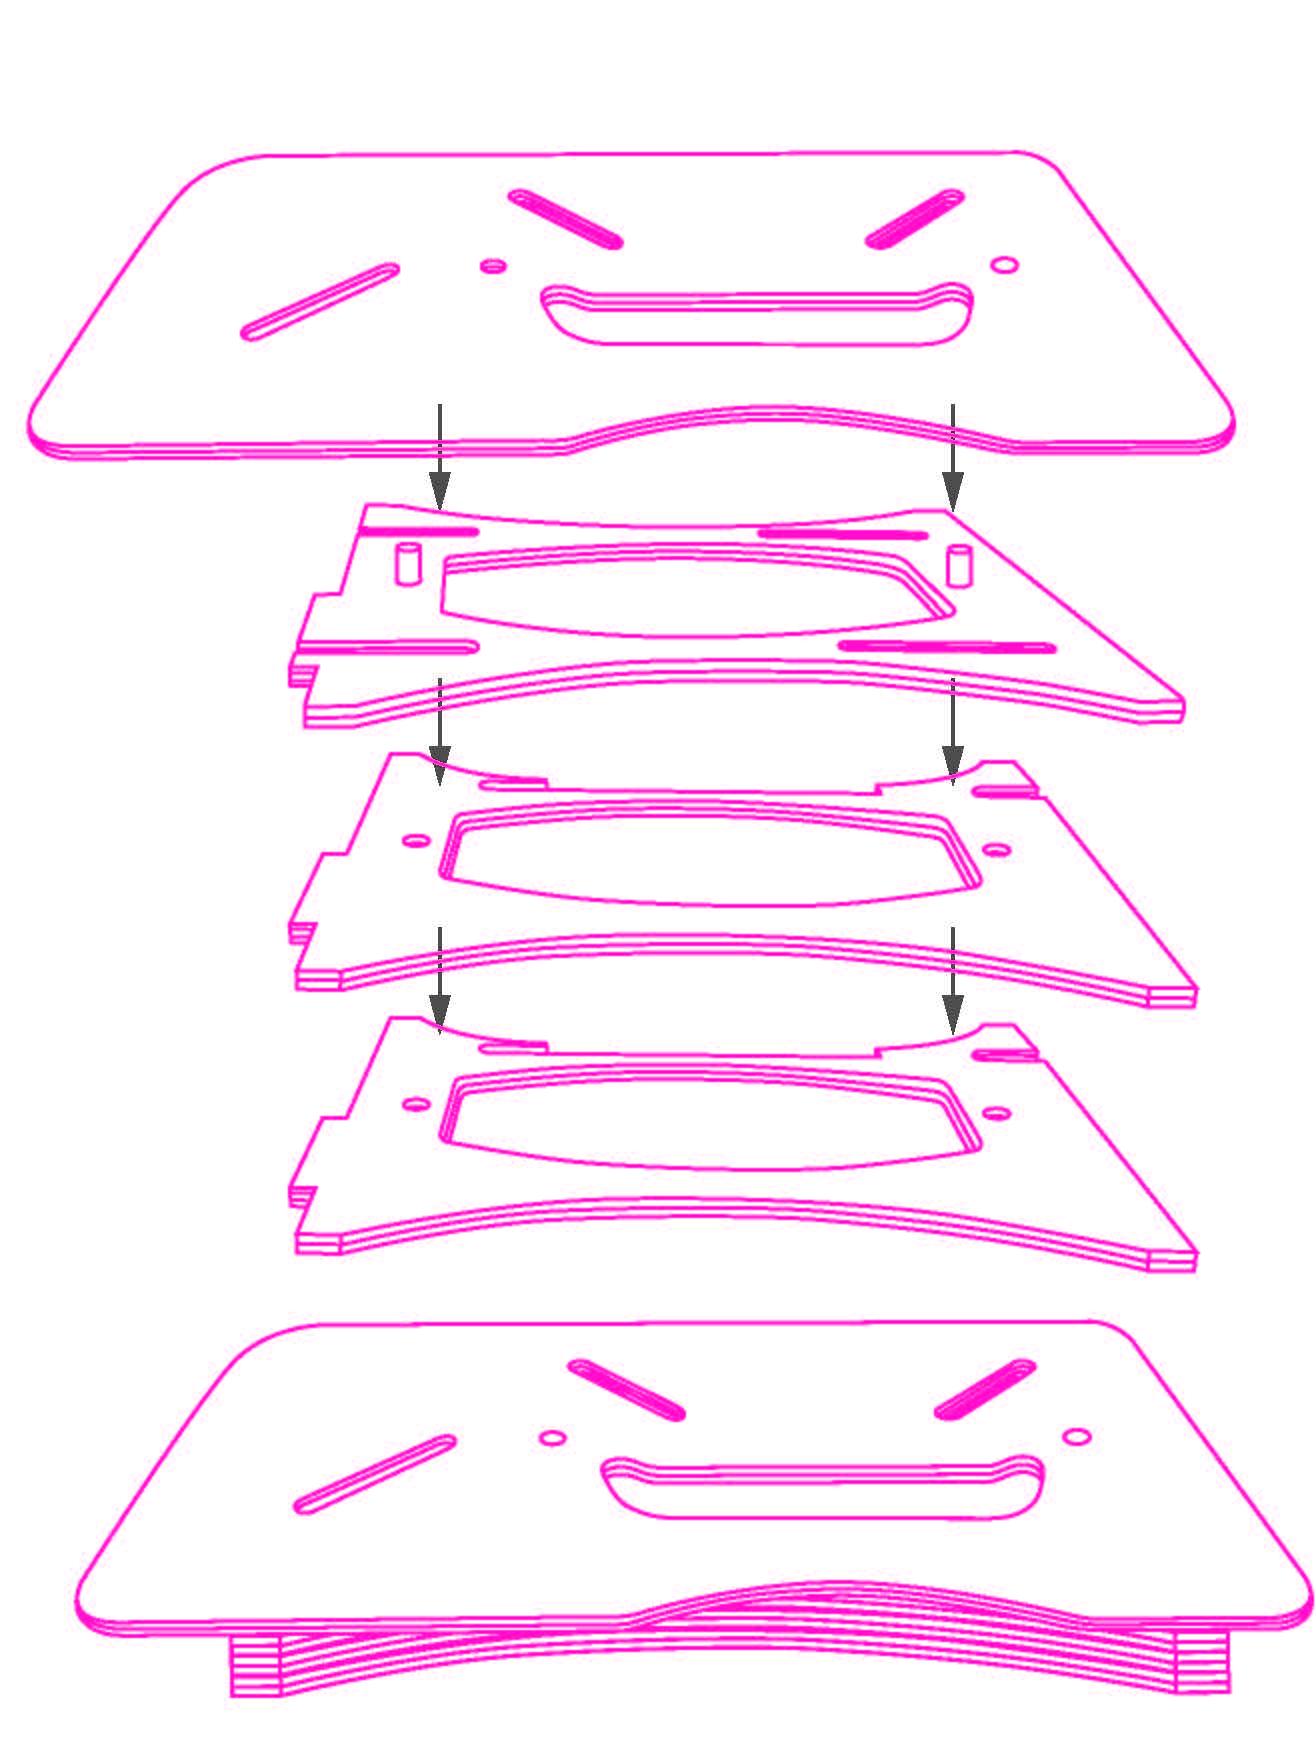 SSM stacking illustration